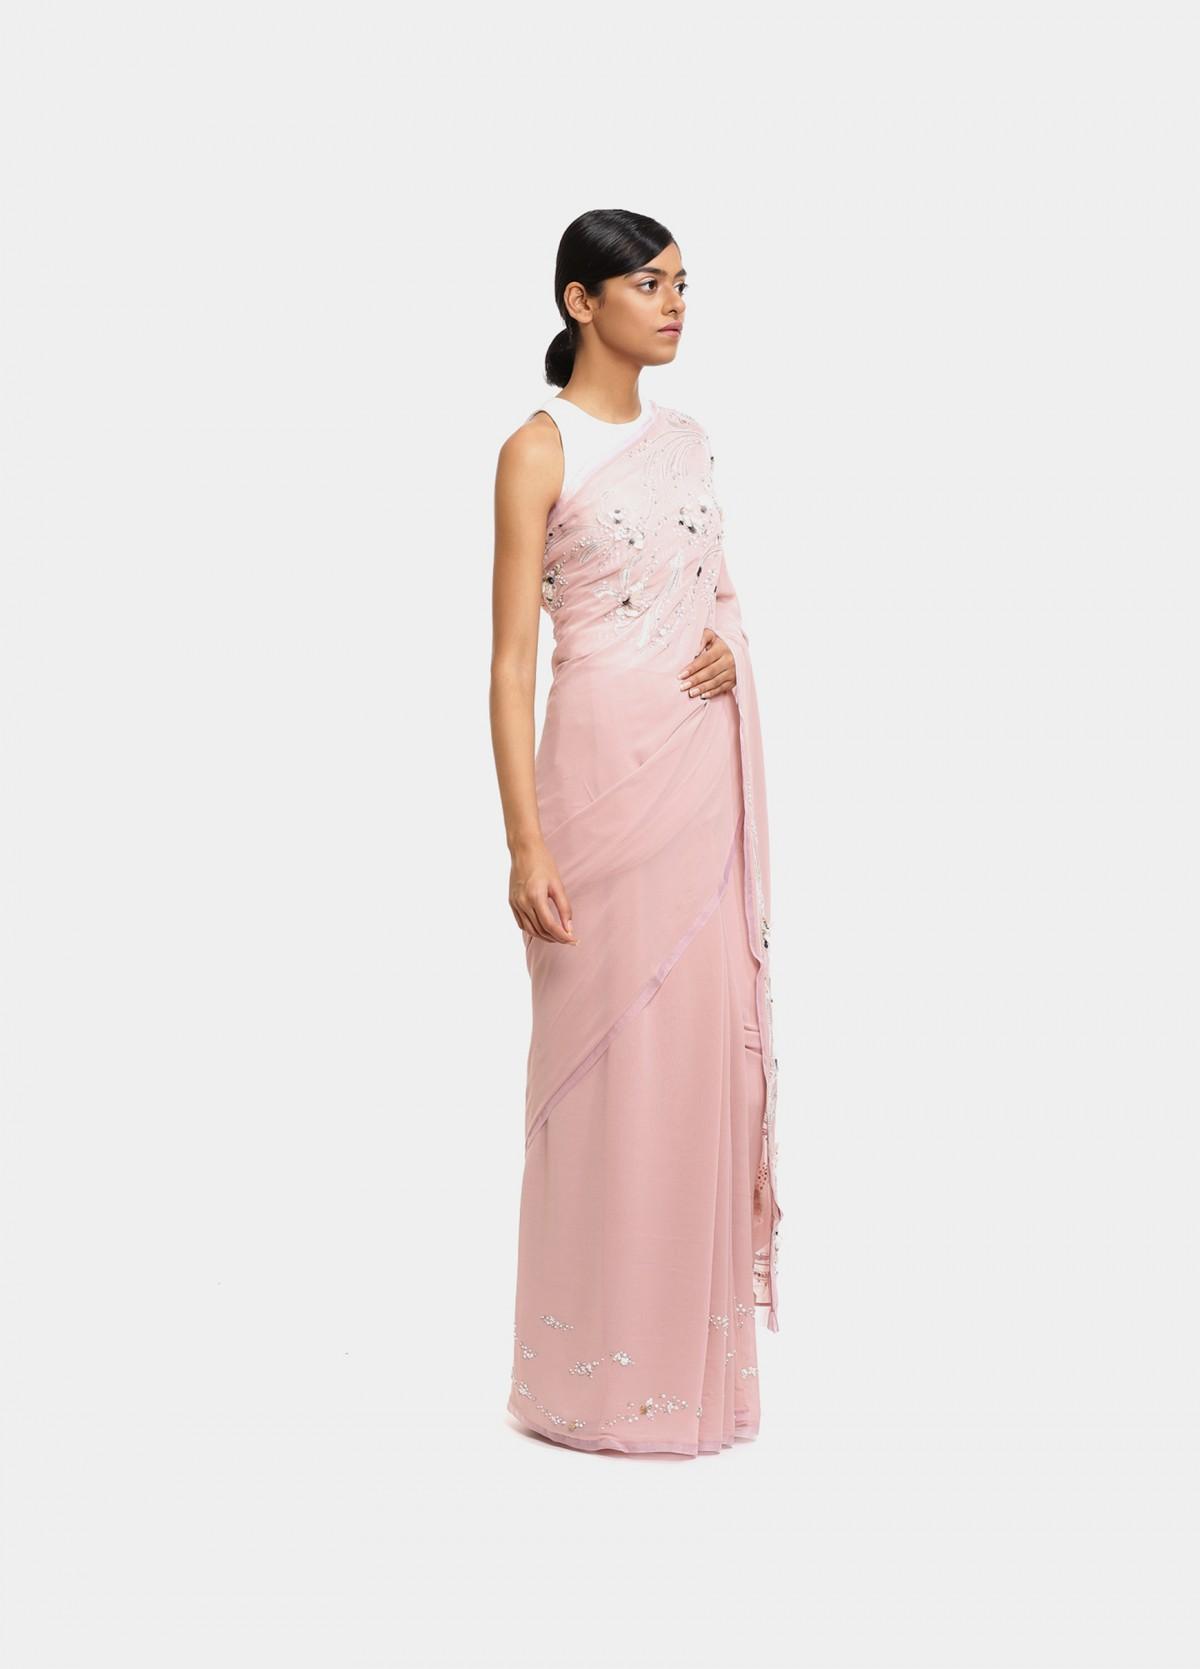 The Petal Swirls Sari